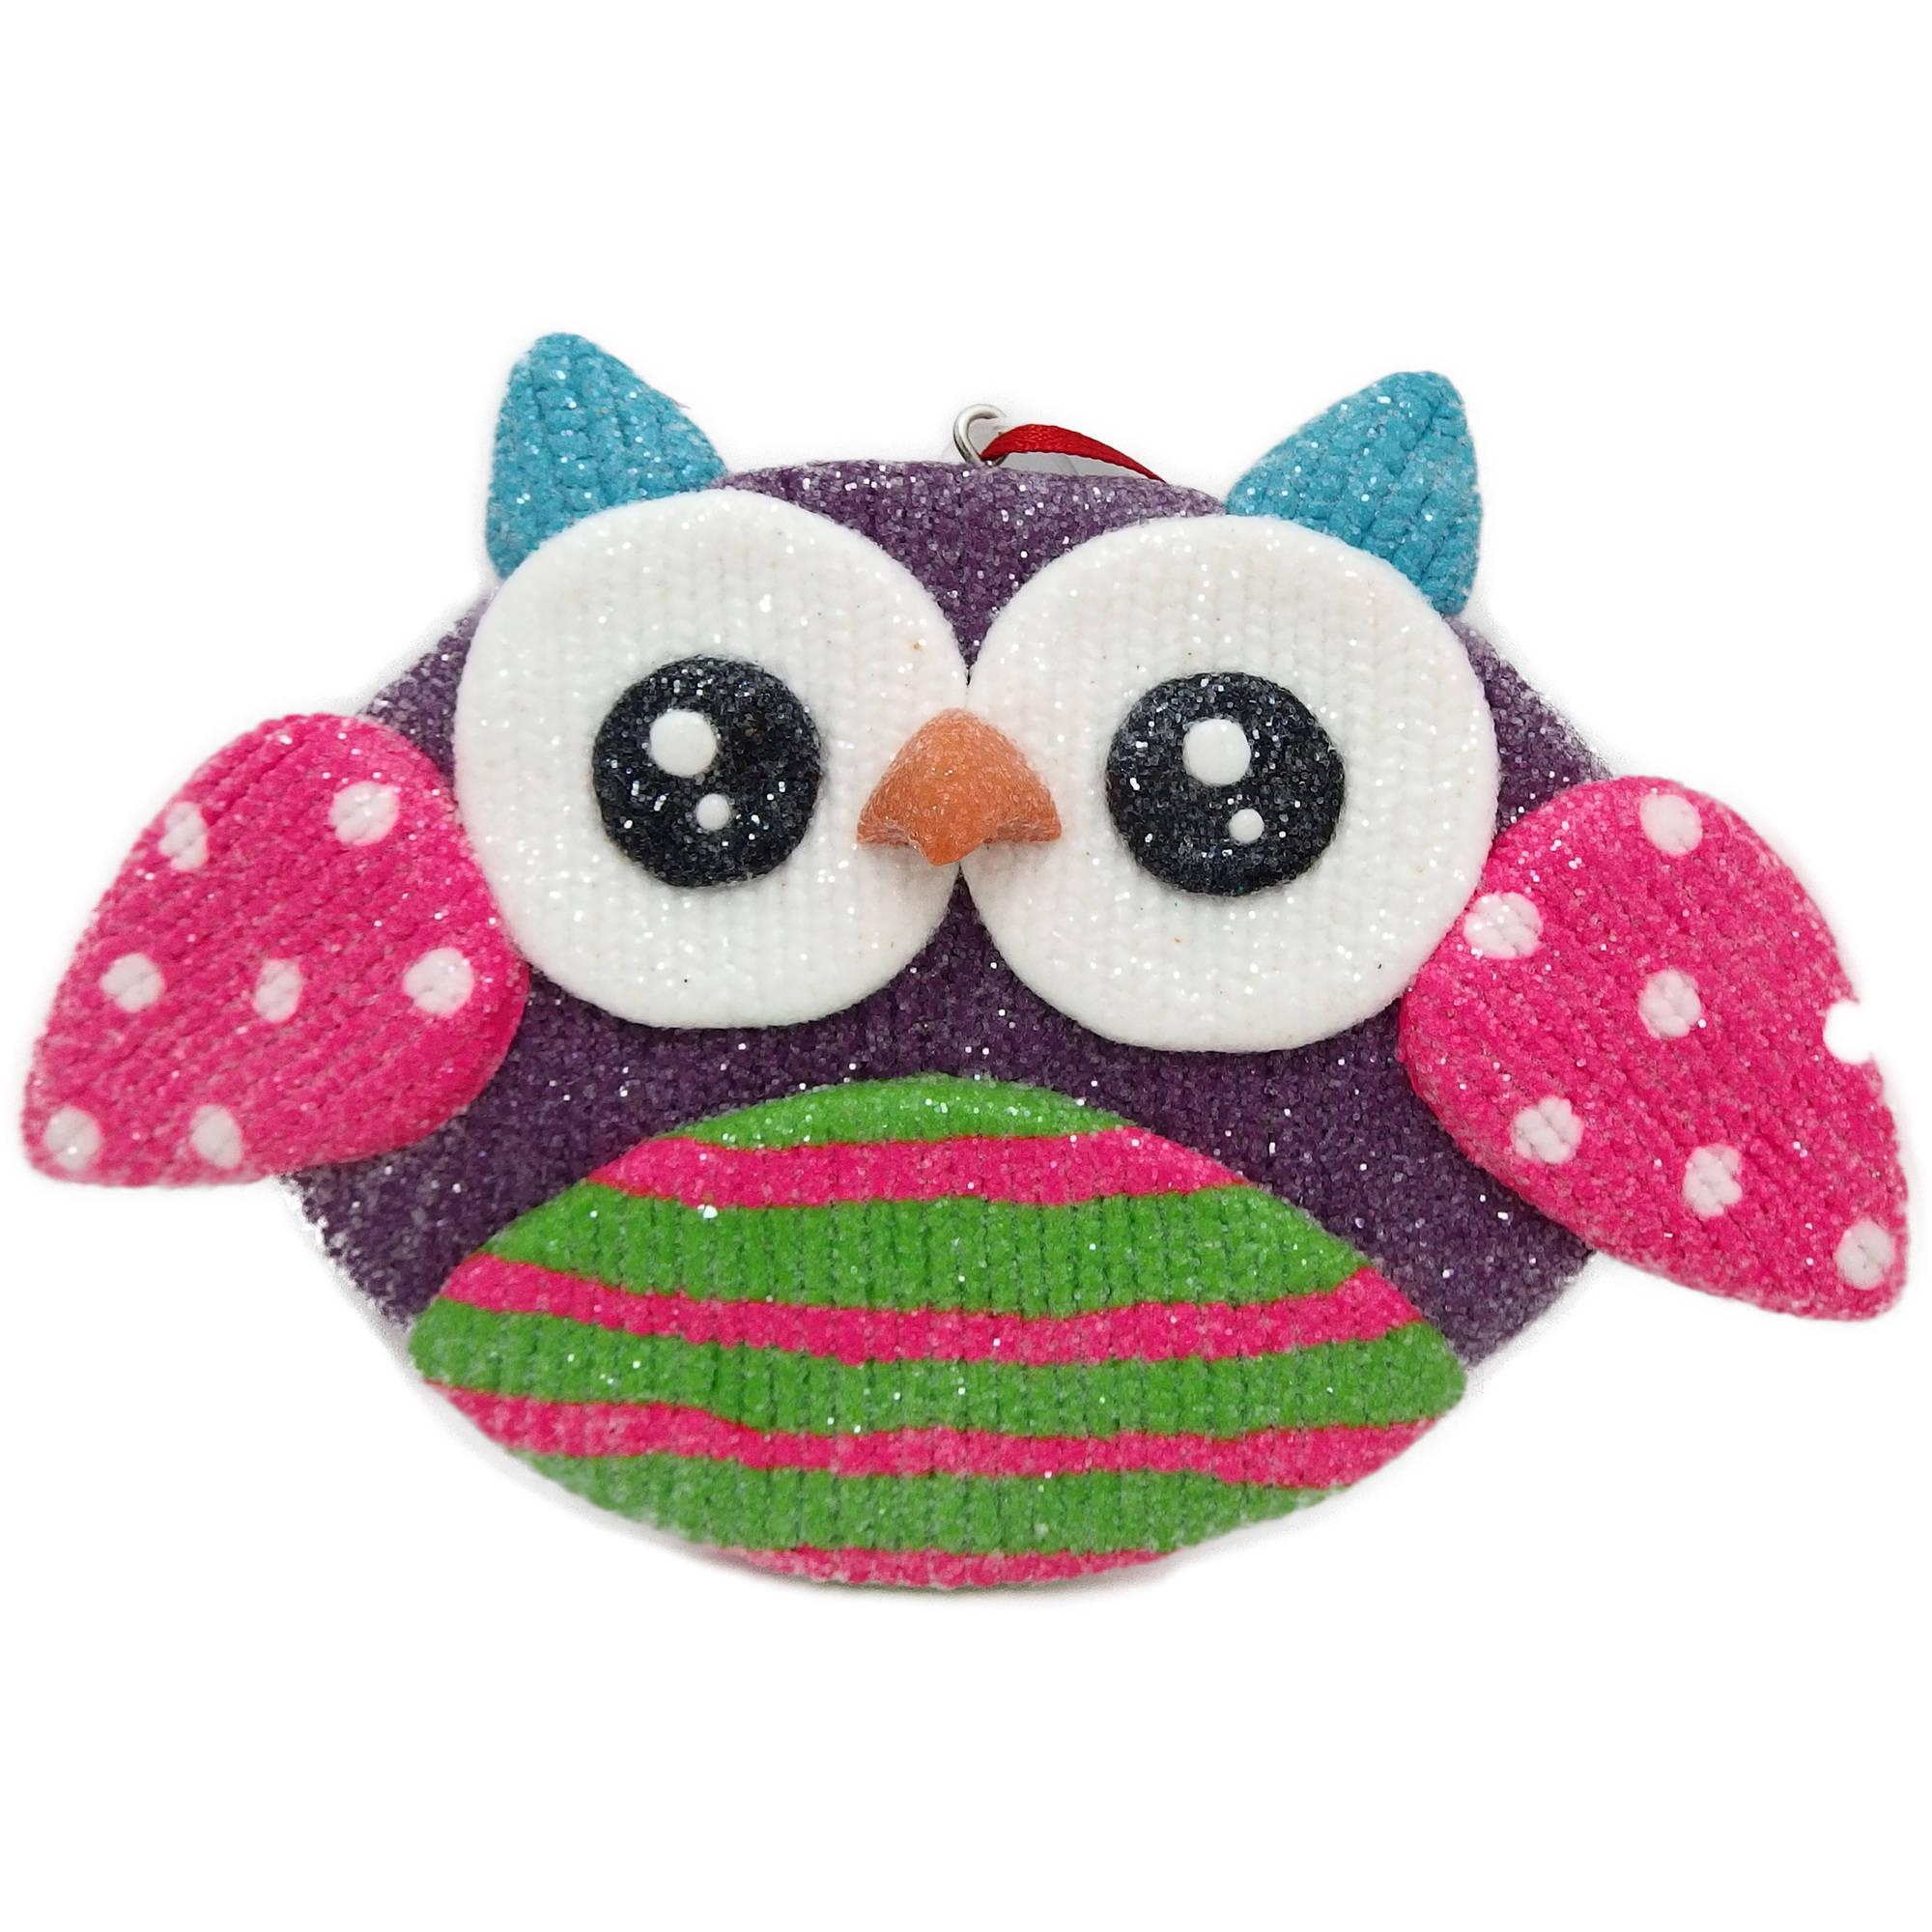 Holiday Time Christmas Ornaments 6-Piece Glitter Claydough Owl Ornament